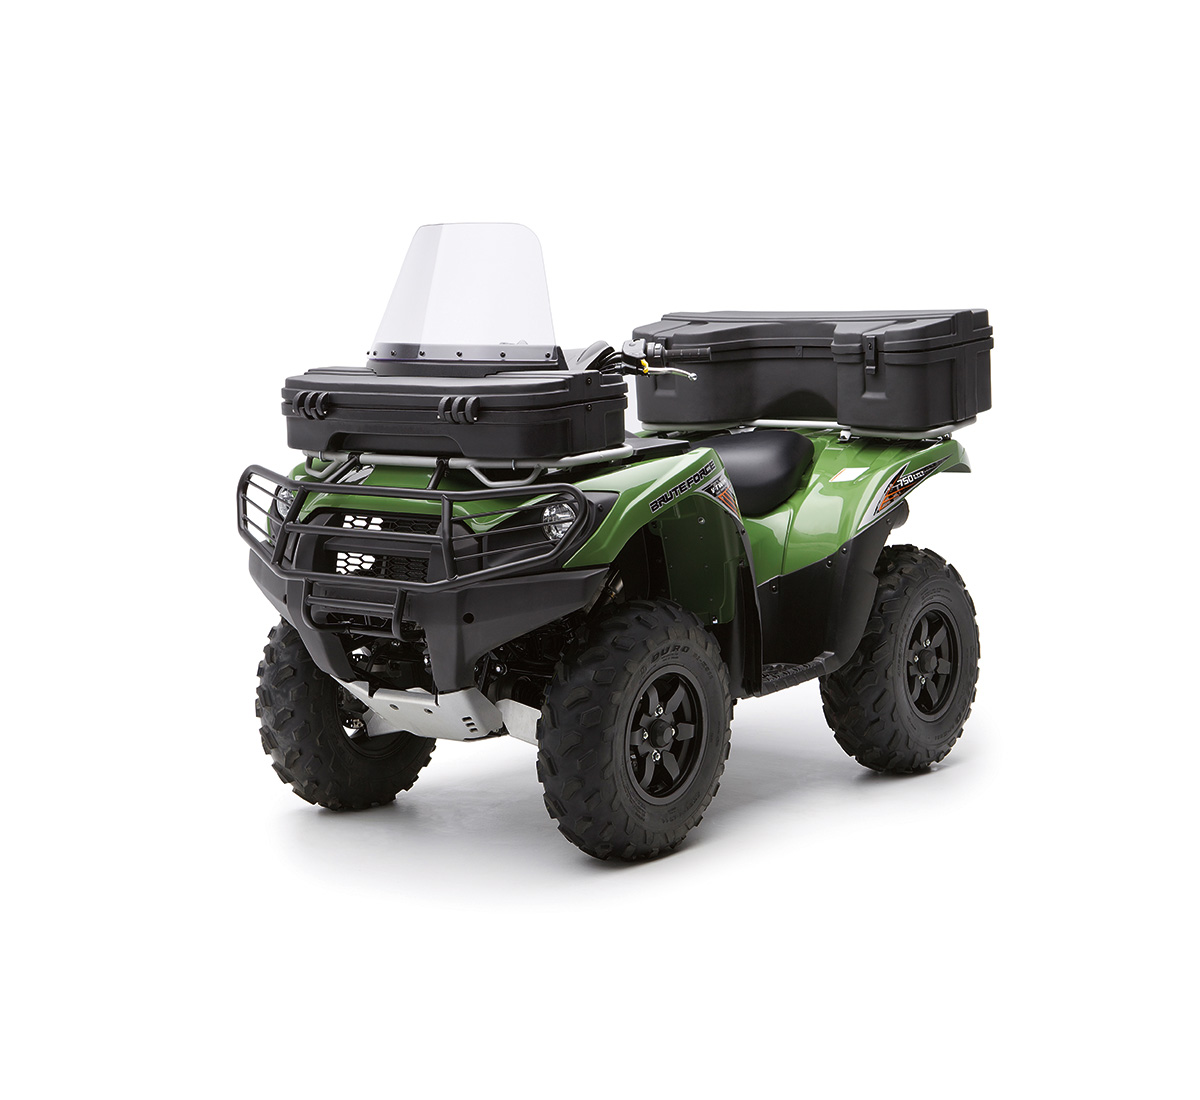 2018 brute force® 750 4x4i sport utility atvkawasaki